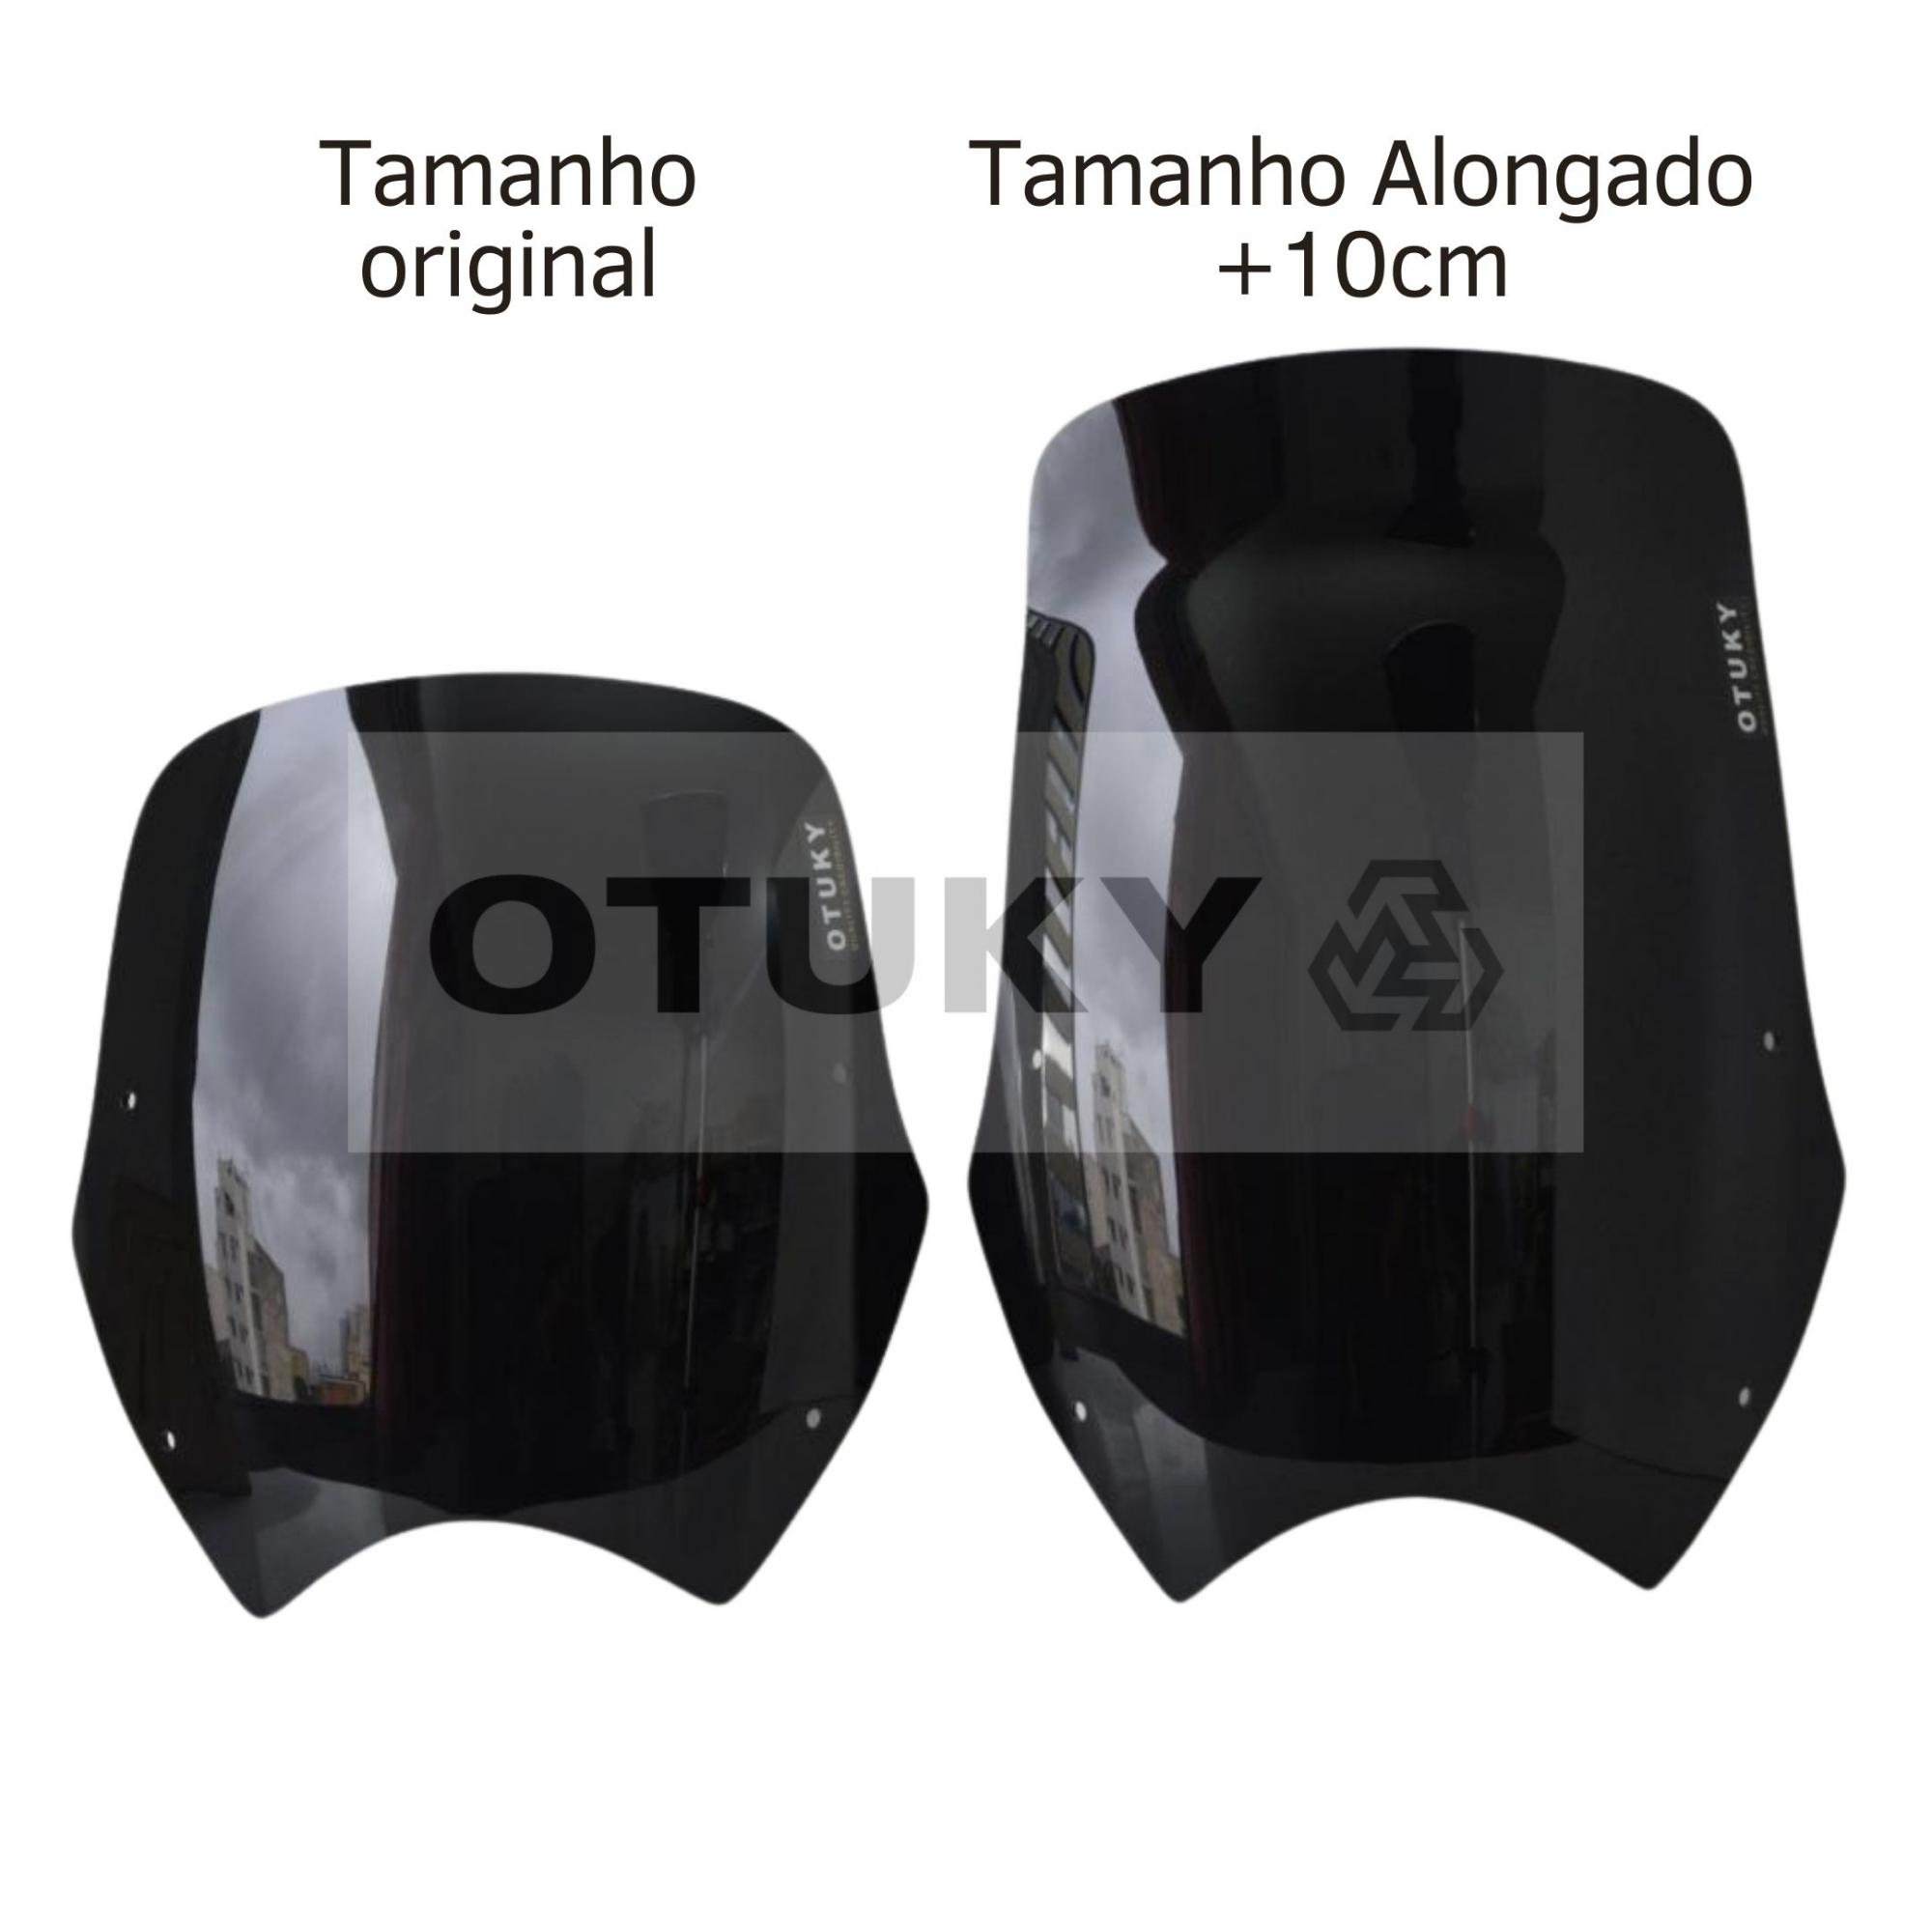 Bolha para Moto Transalp XL 700 V Otuky Alongada Preto